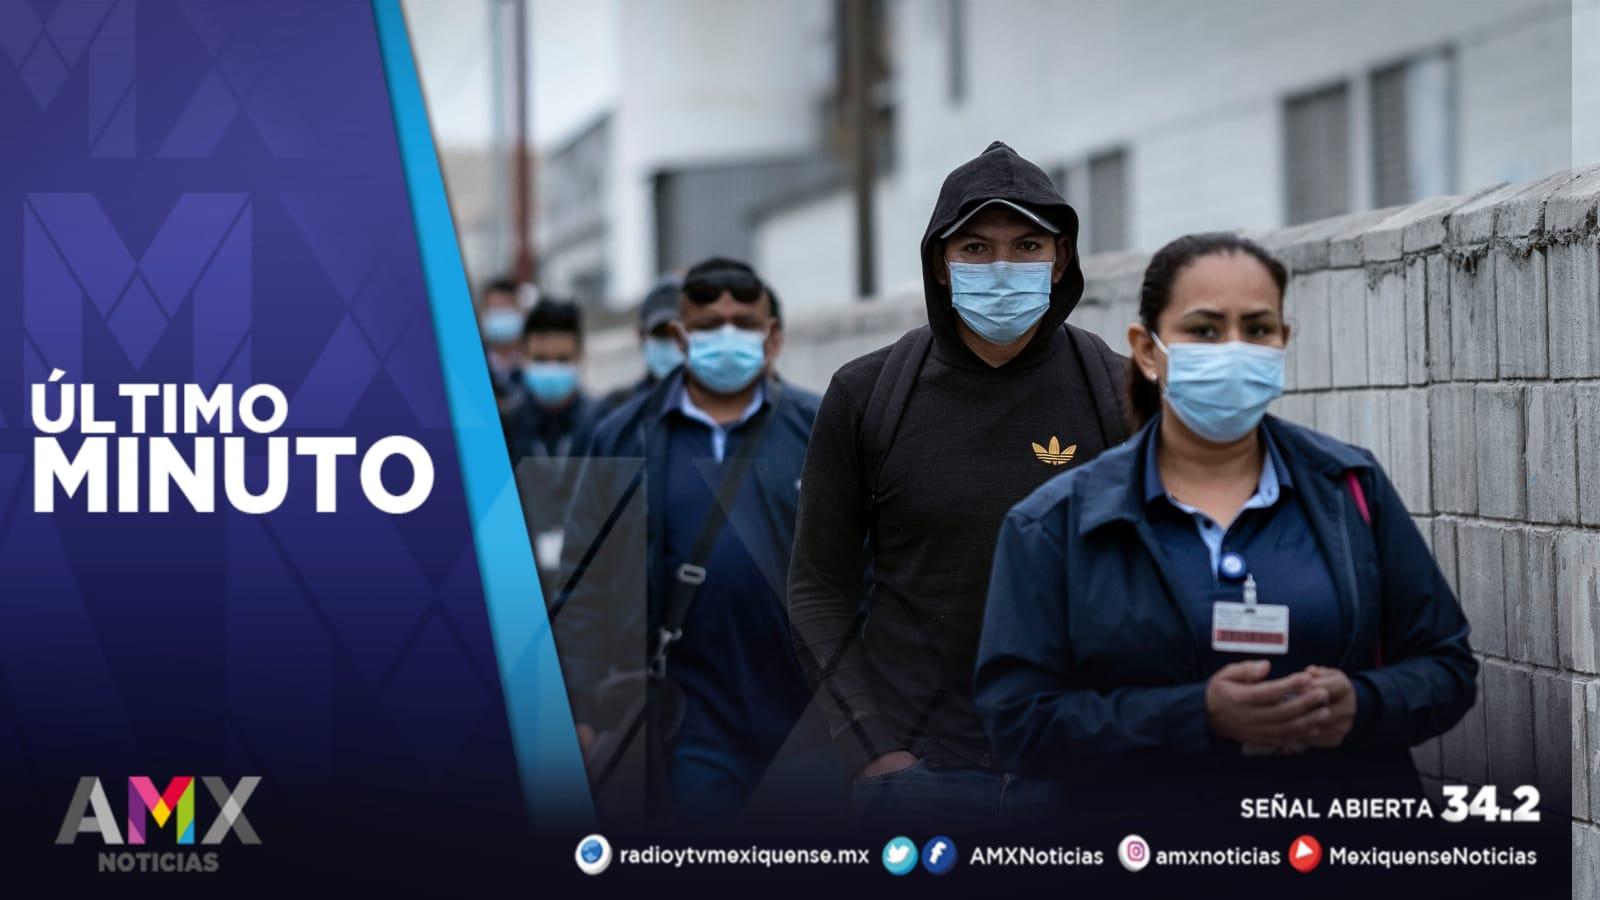 MÉXICO ACUMULA 234 MIL 969 MUERTES POR COVID-19